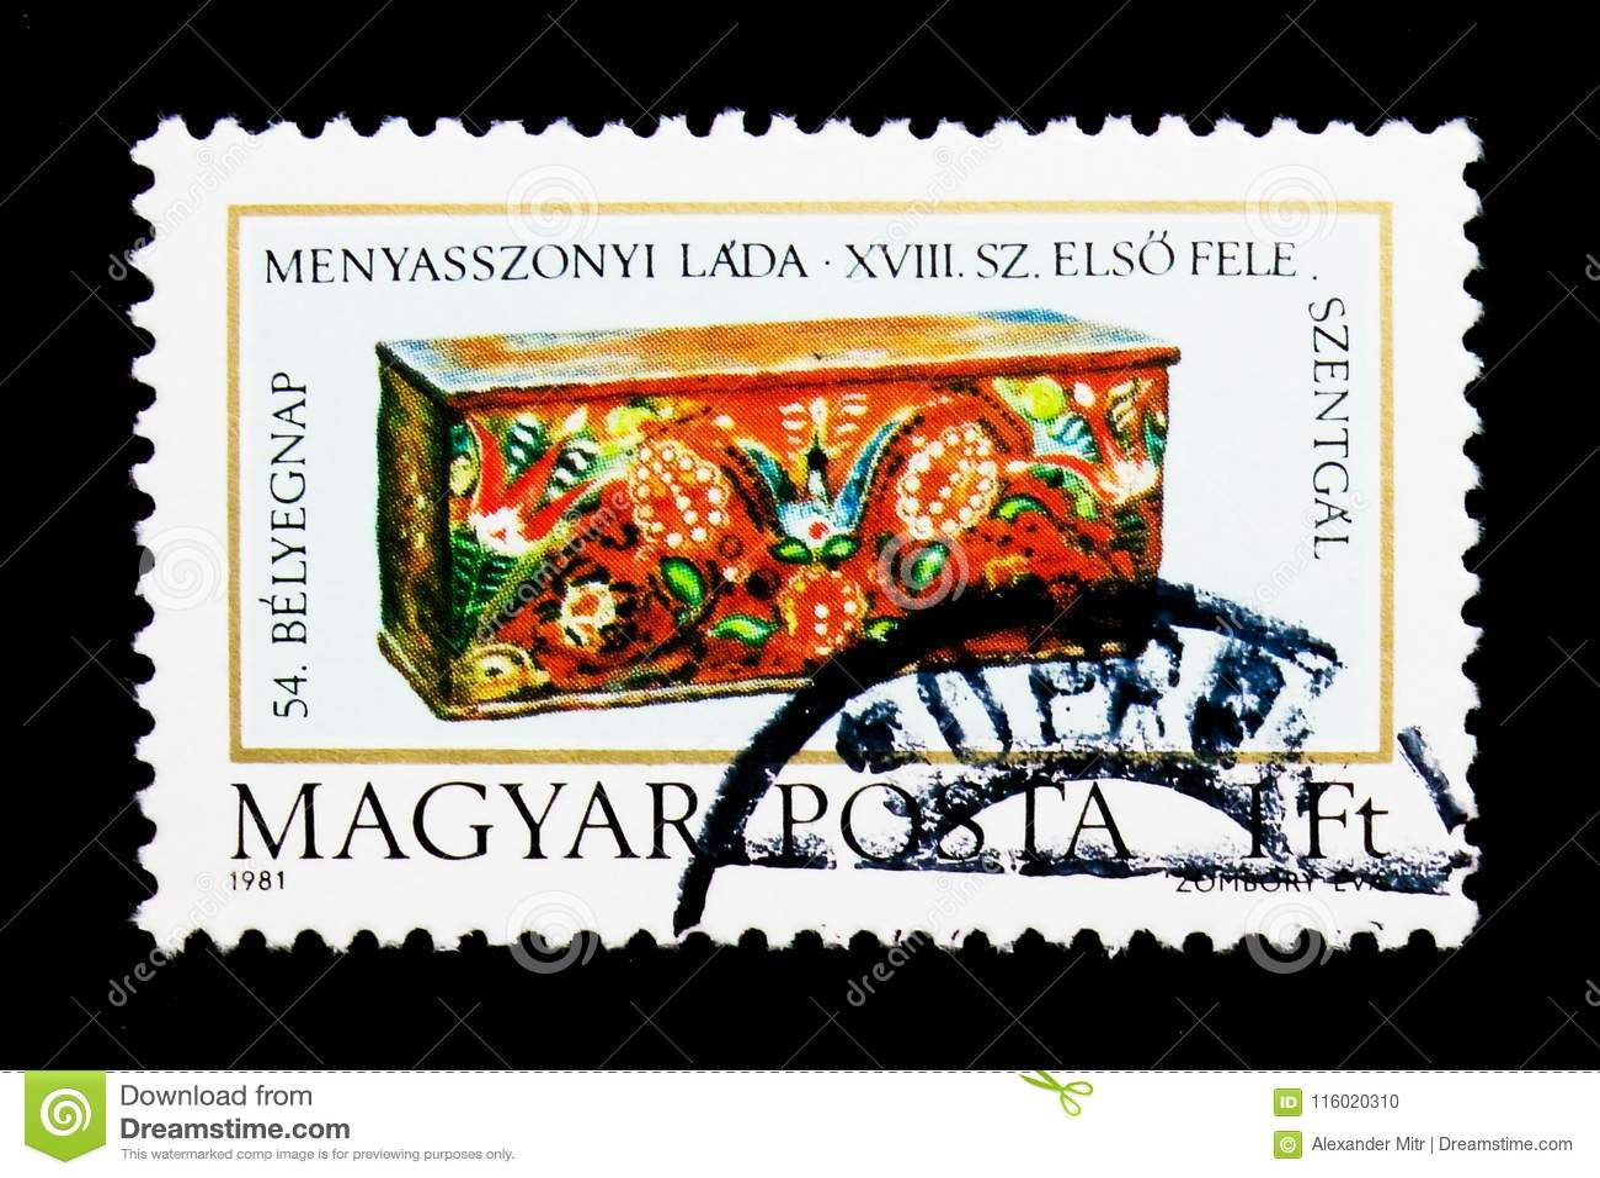 Bridal box, 54th Stamp Day - Bridal chests, serie, circa 1981